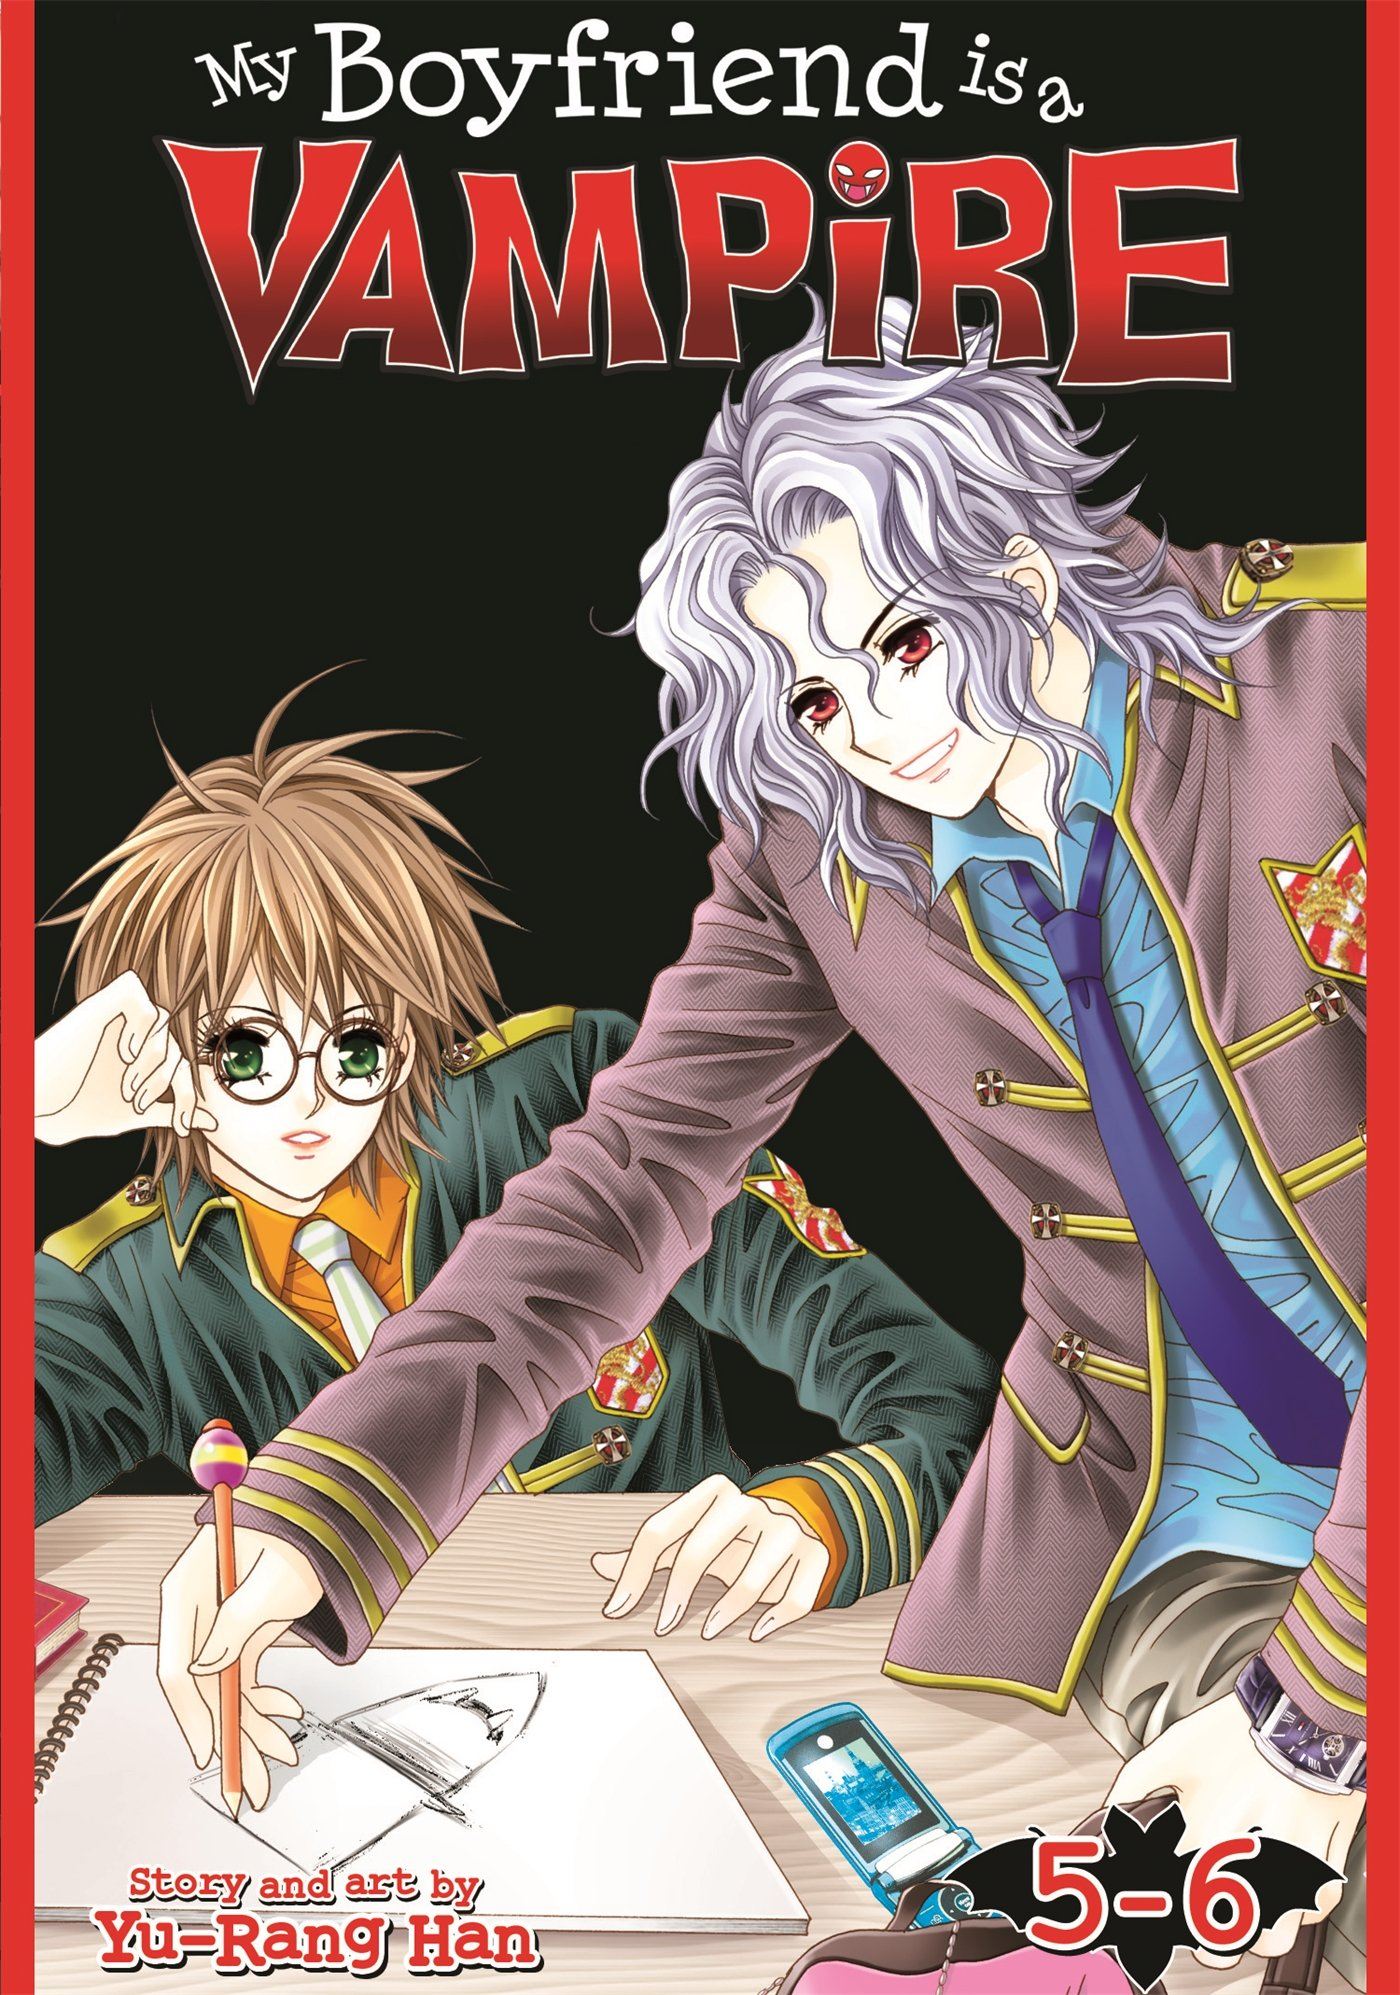 My Boyfriend is a Vampire Vol. 5-6 by Seven Seas